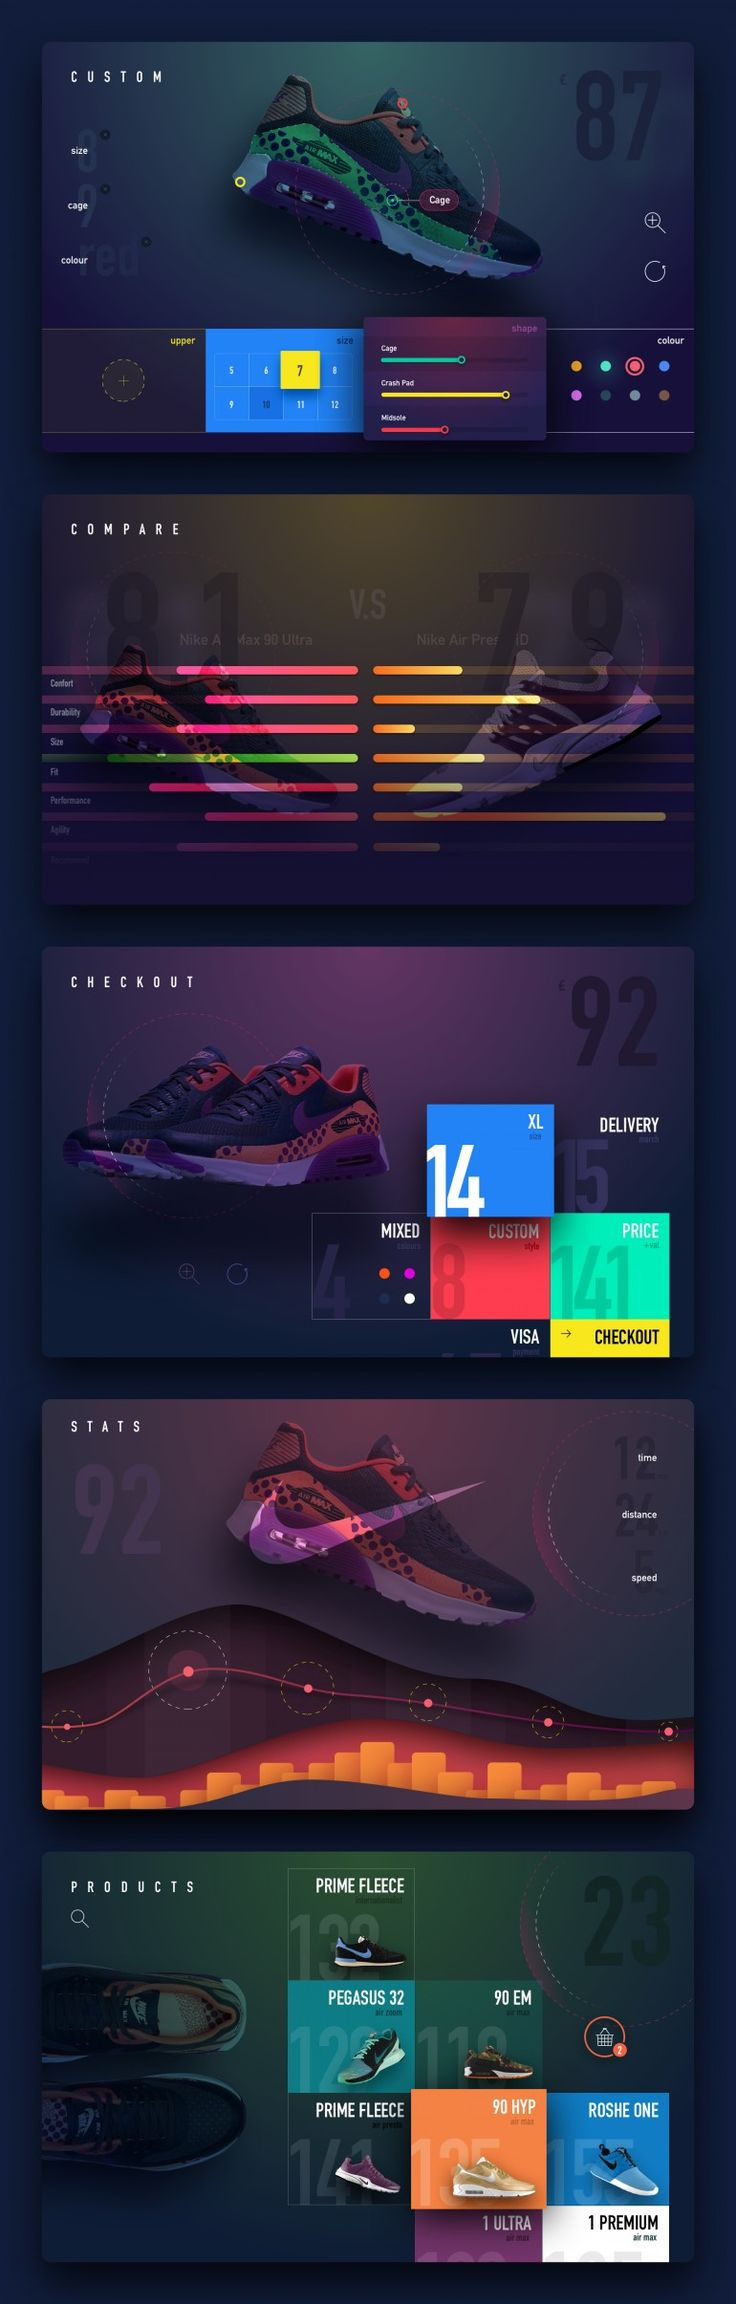 Nike90 Store by Balraj Chana